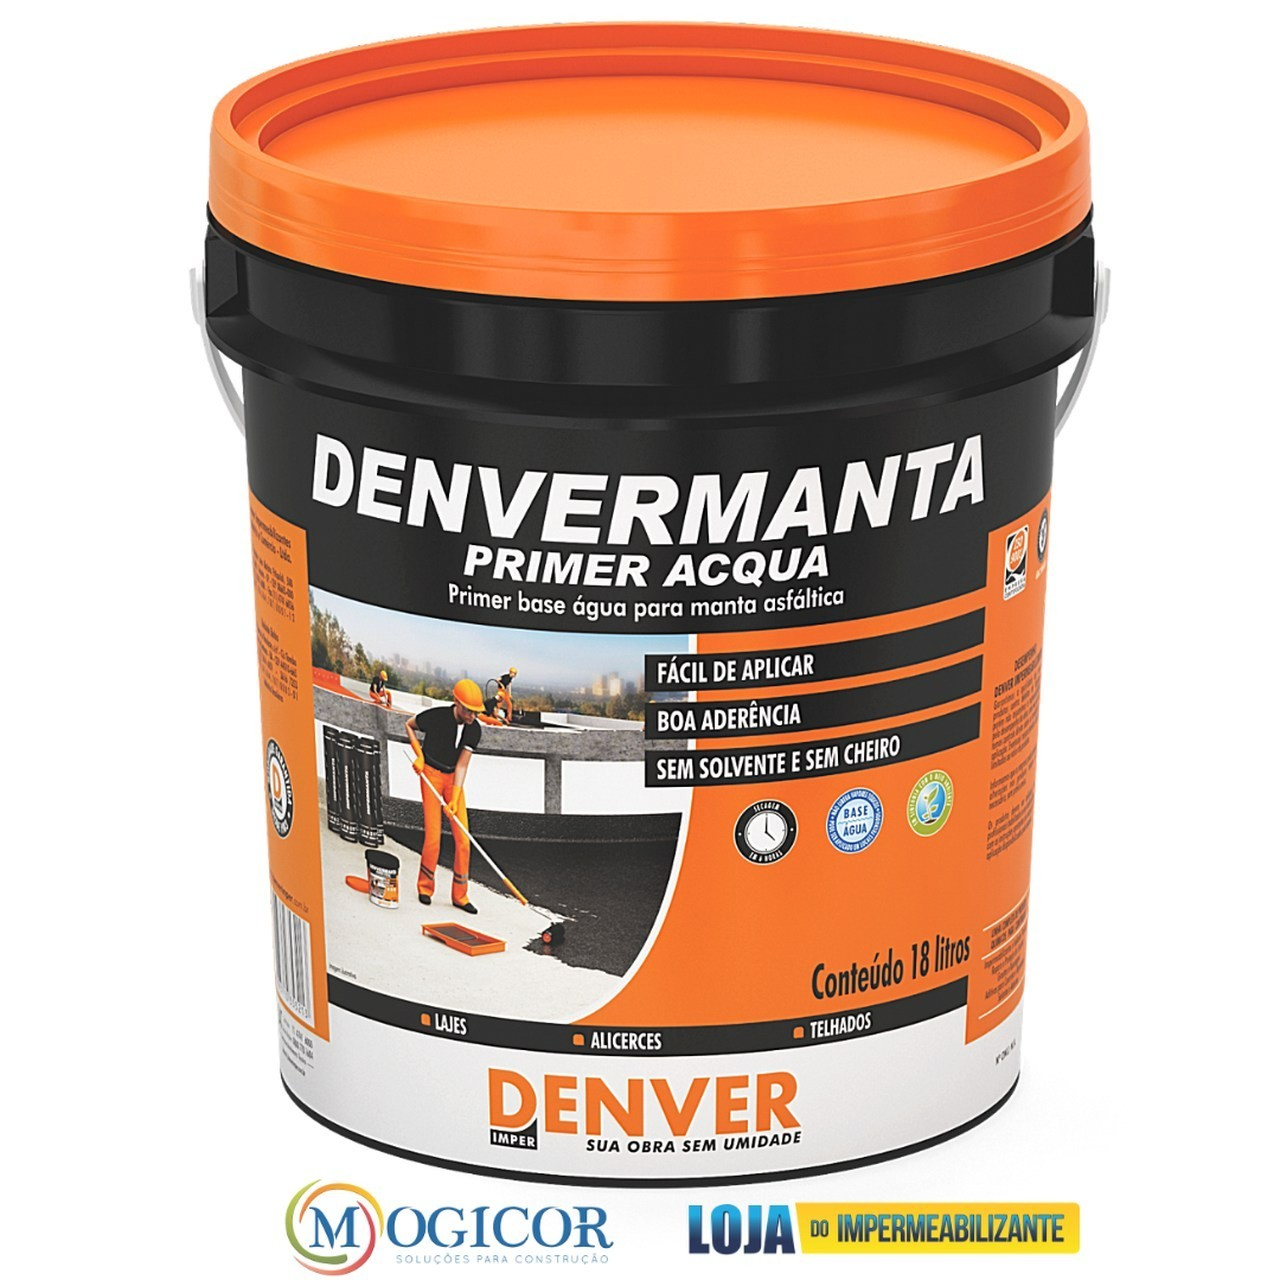 Denvermanta Primer Acqua 3,6 L